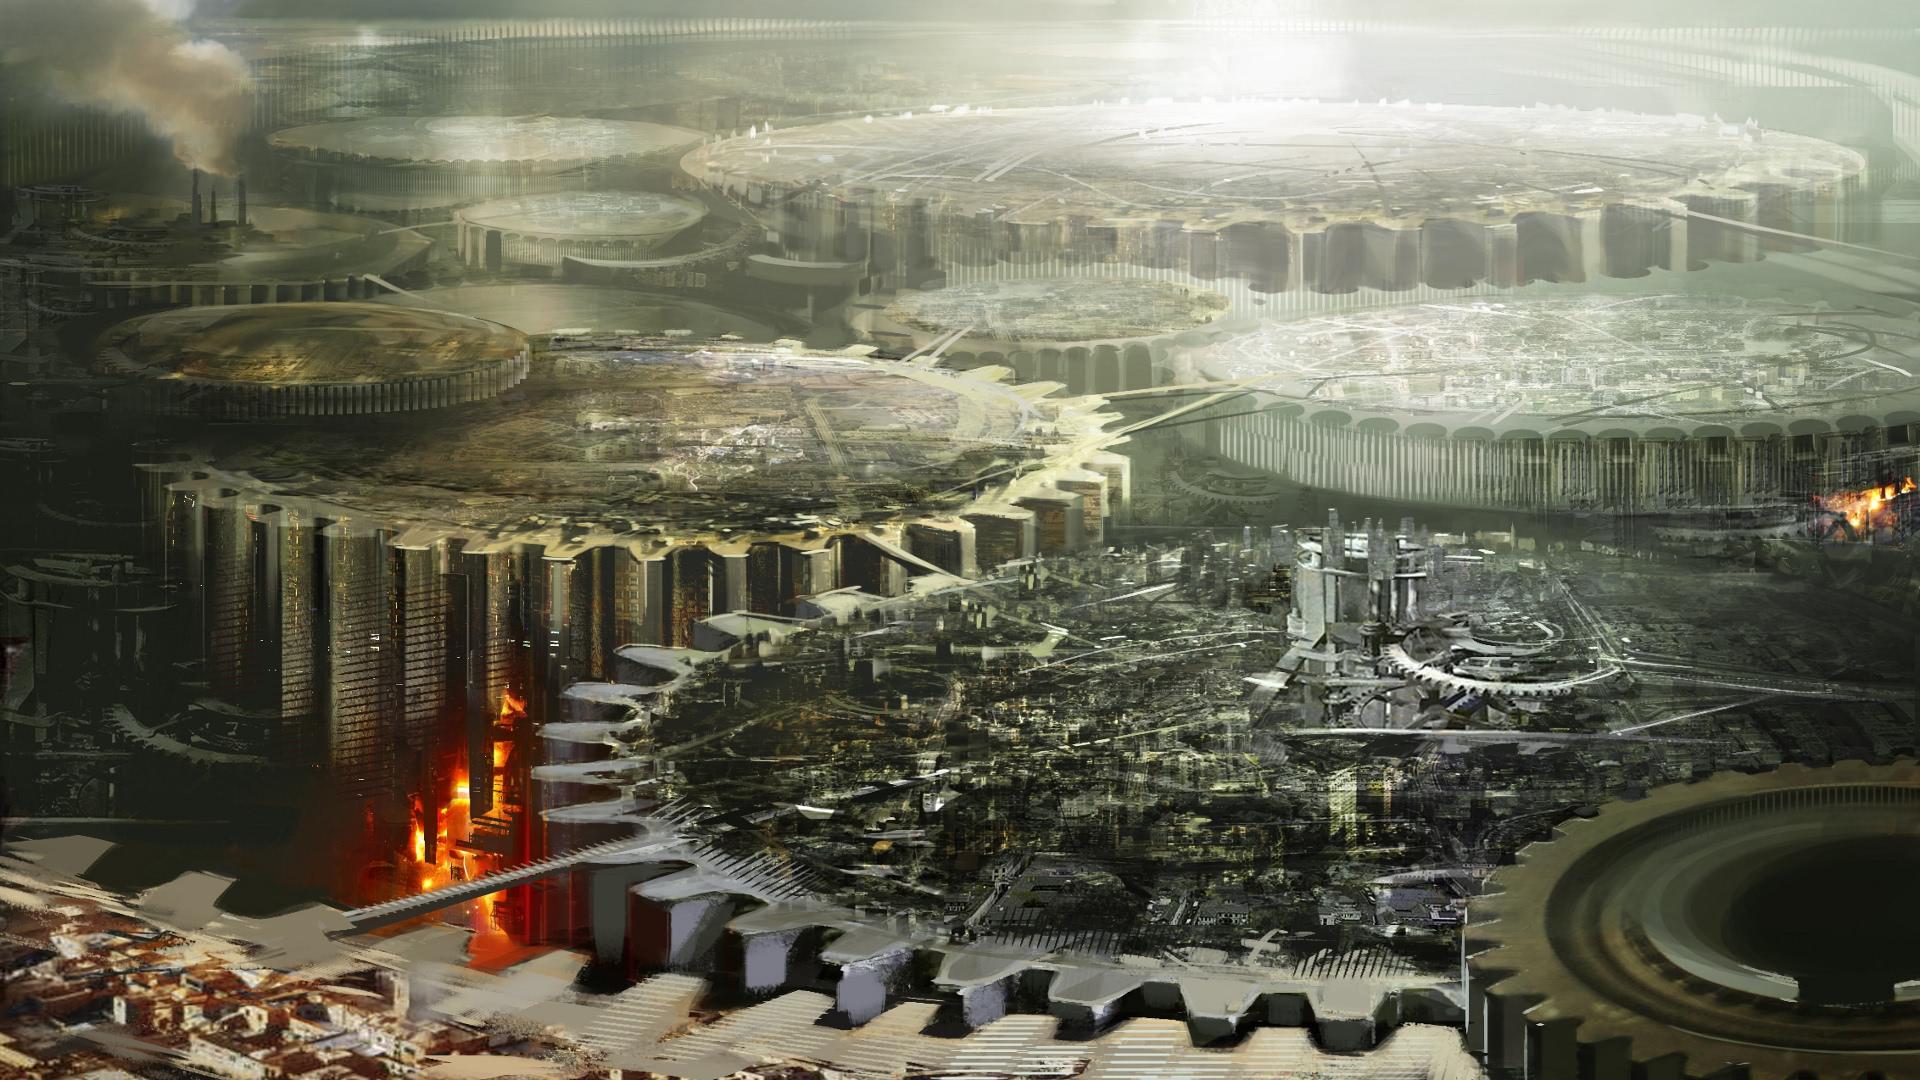 General 1920x1080 gears apocalyptic futuristic city